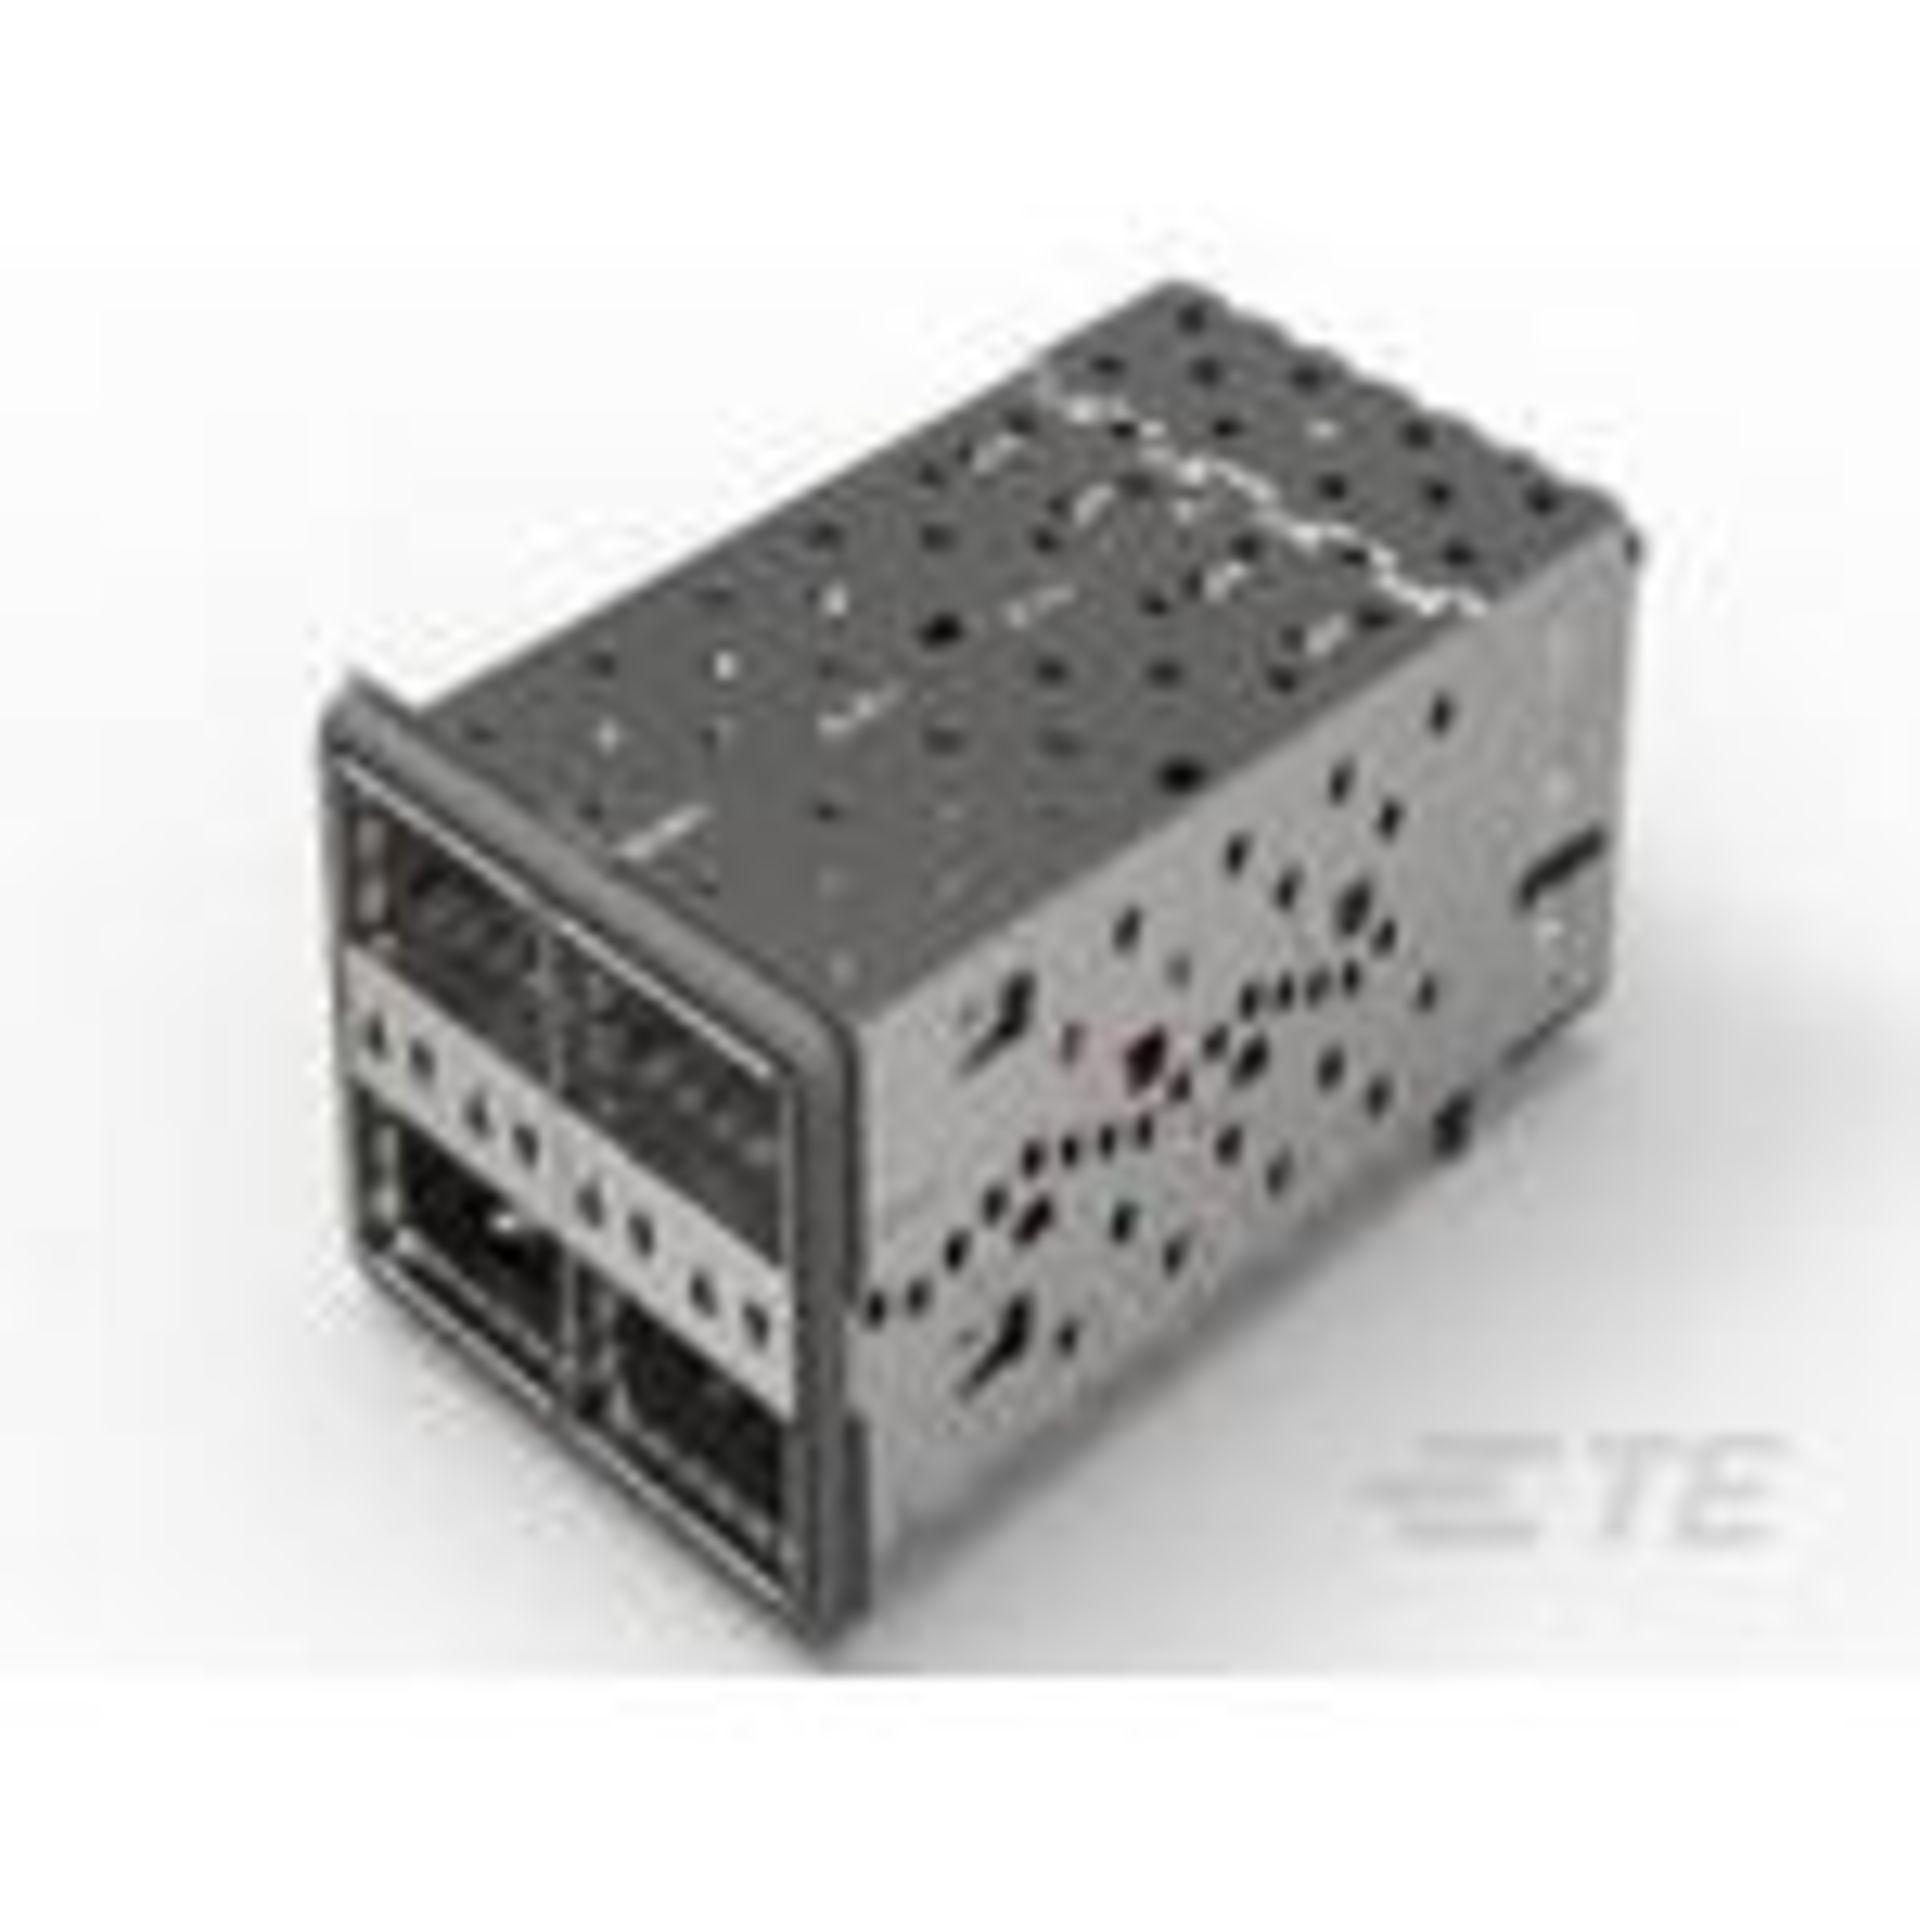 TE Connectivity 2214574-3, Connector Telephone and Telecom, Conn QSFP F 152 POS Press Fit RA Thru-